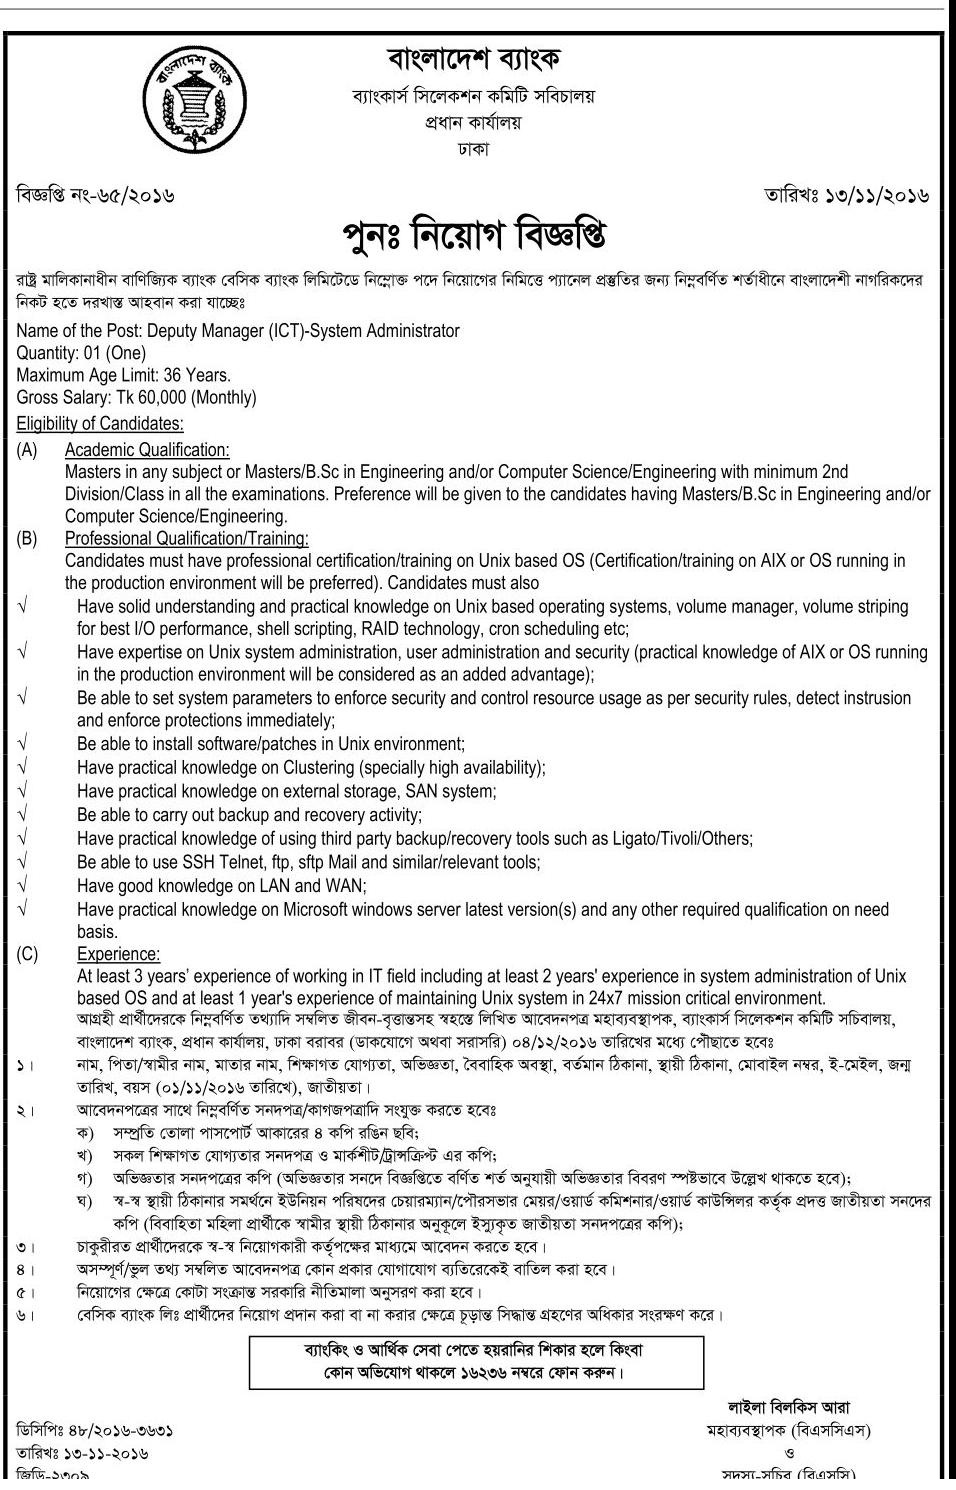 BASIC Bank Job Circular November 2016.